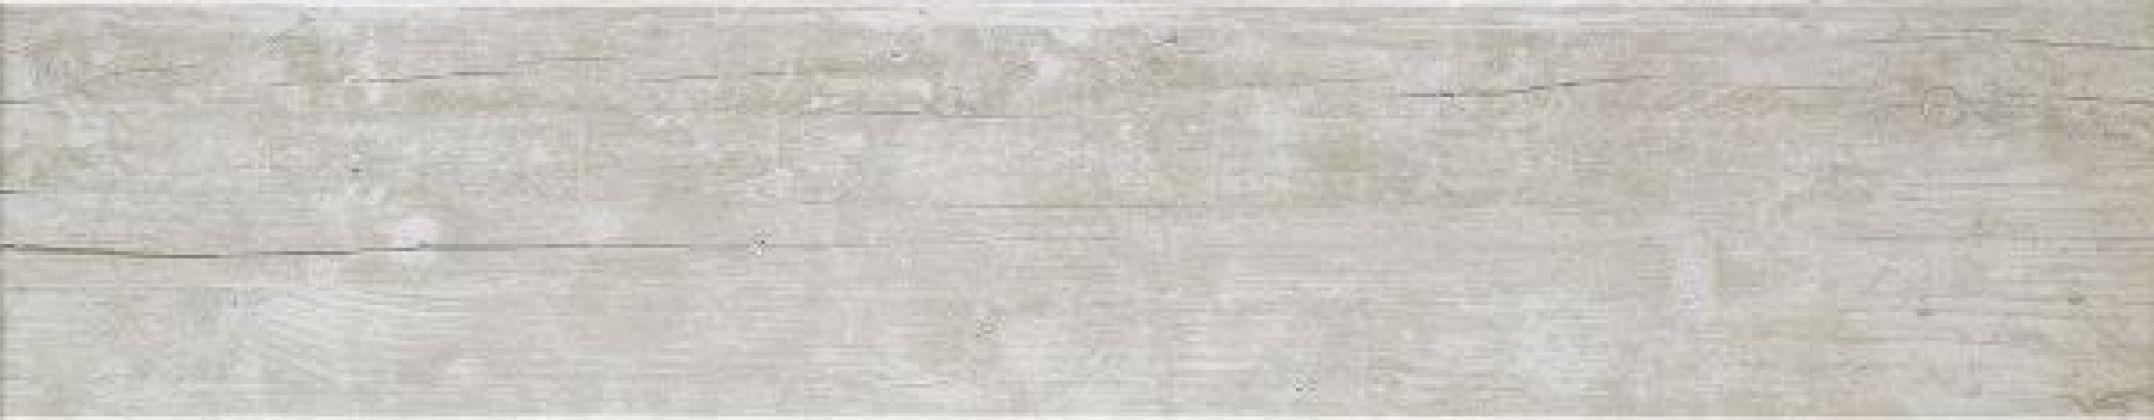 ENDOR BLANCO 23x120